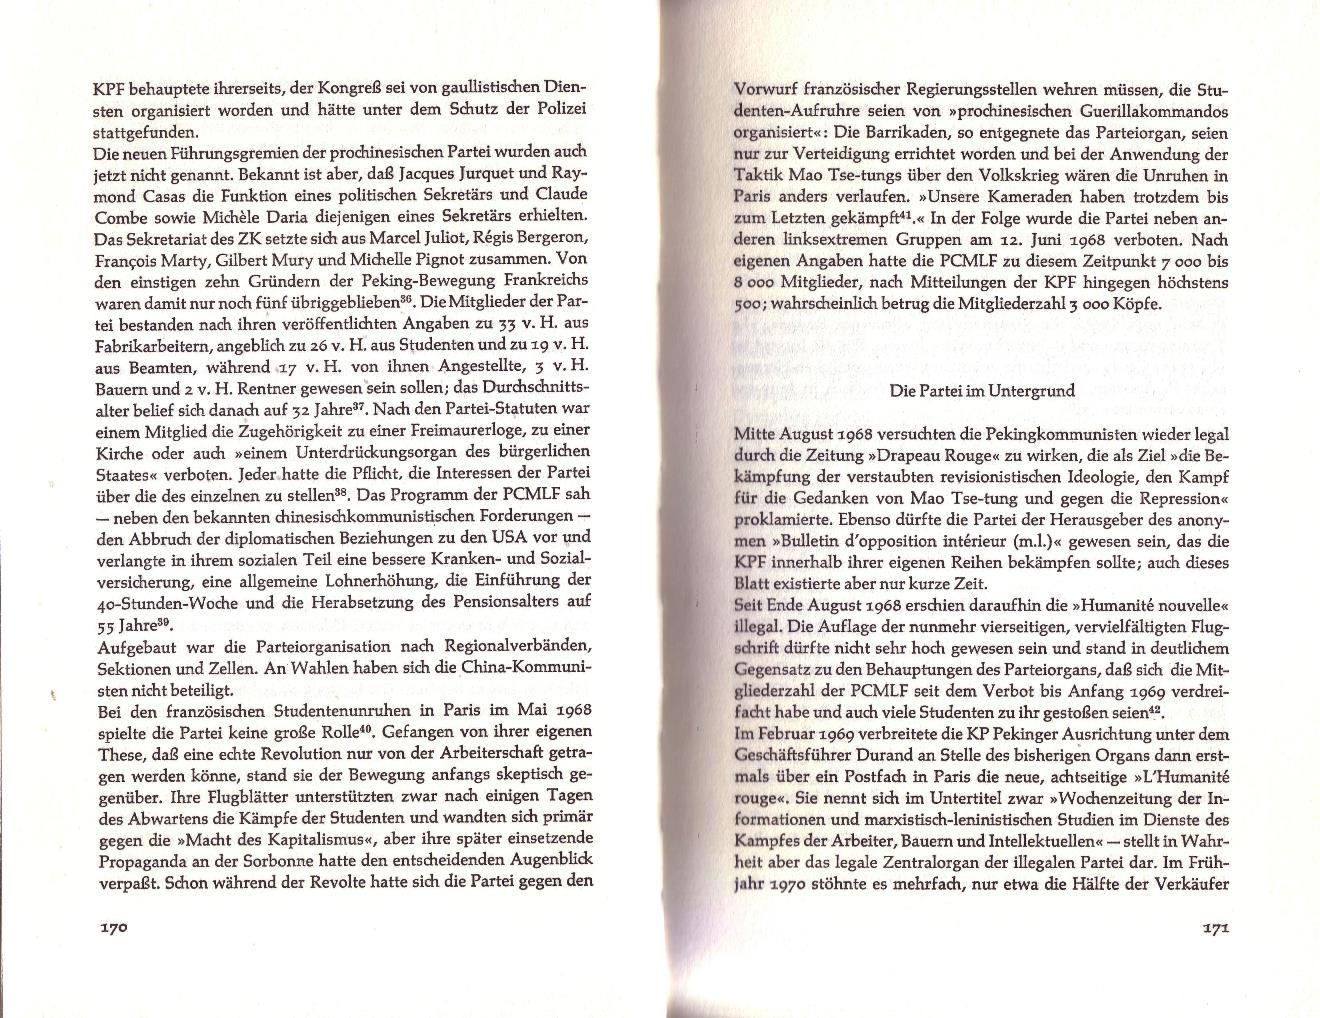 Schlomann_Friedlingstein_Die_Maoisten_0088